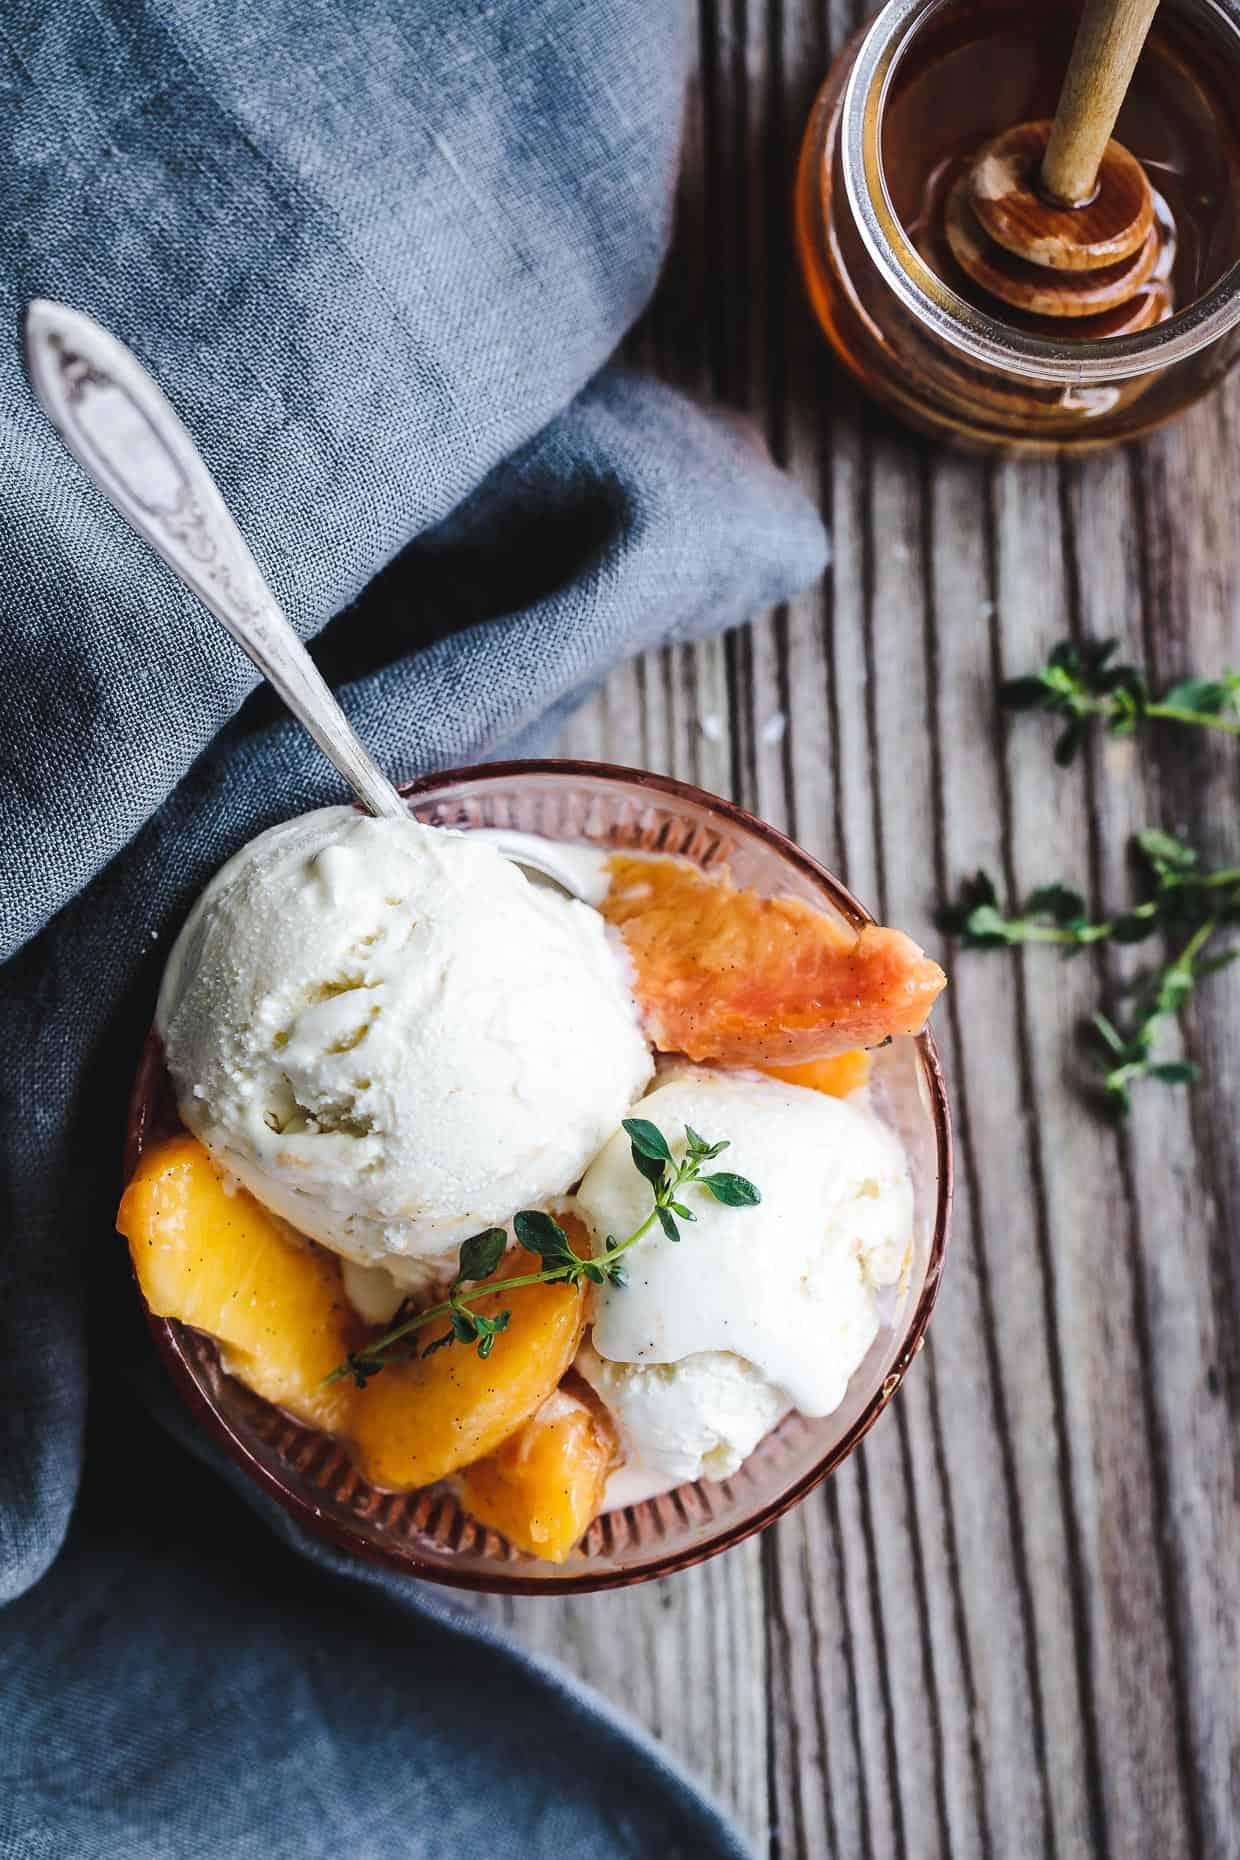 Honey and Lemon Thyme Ricotta Ice Cream with Vanilla Peaches